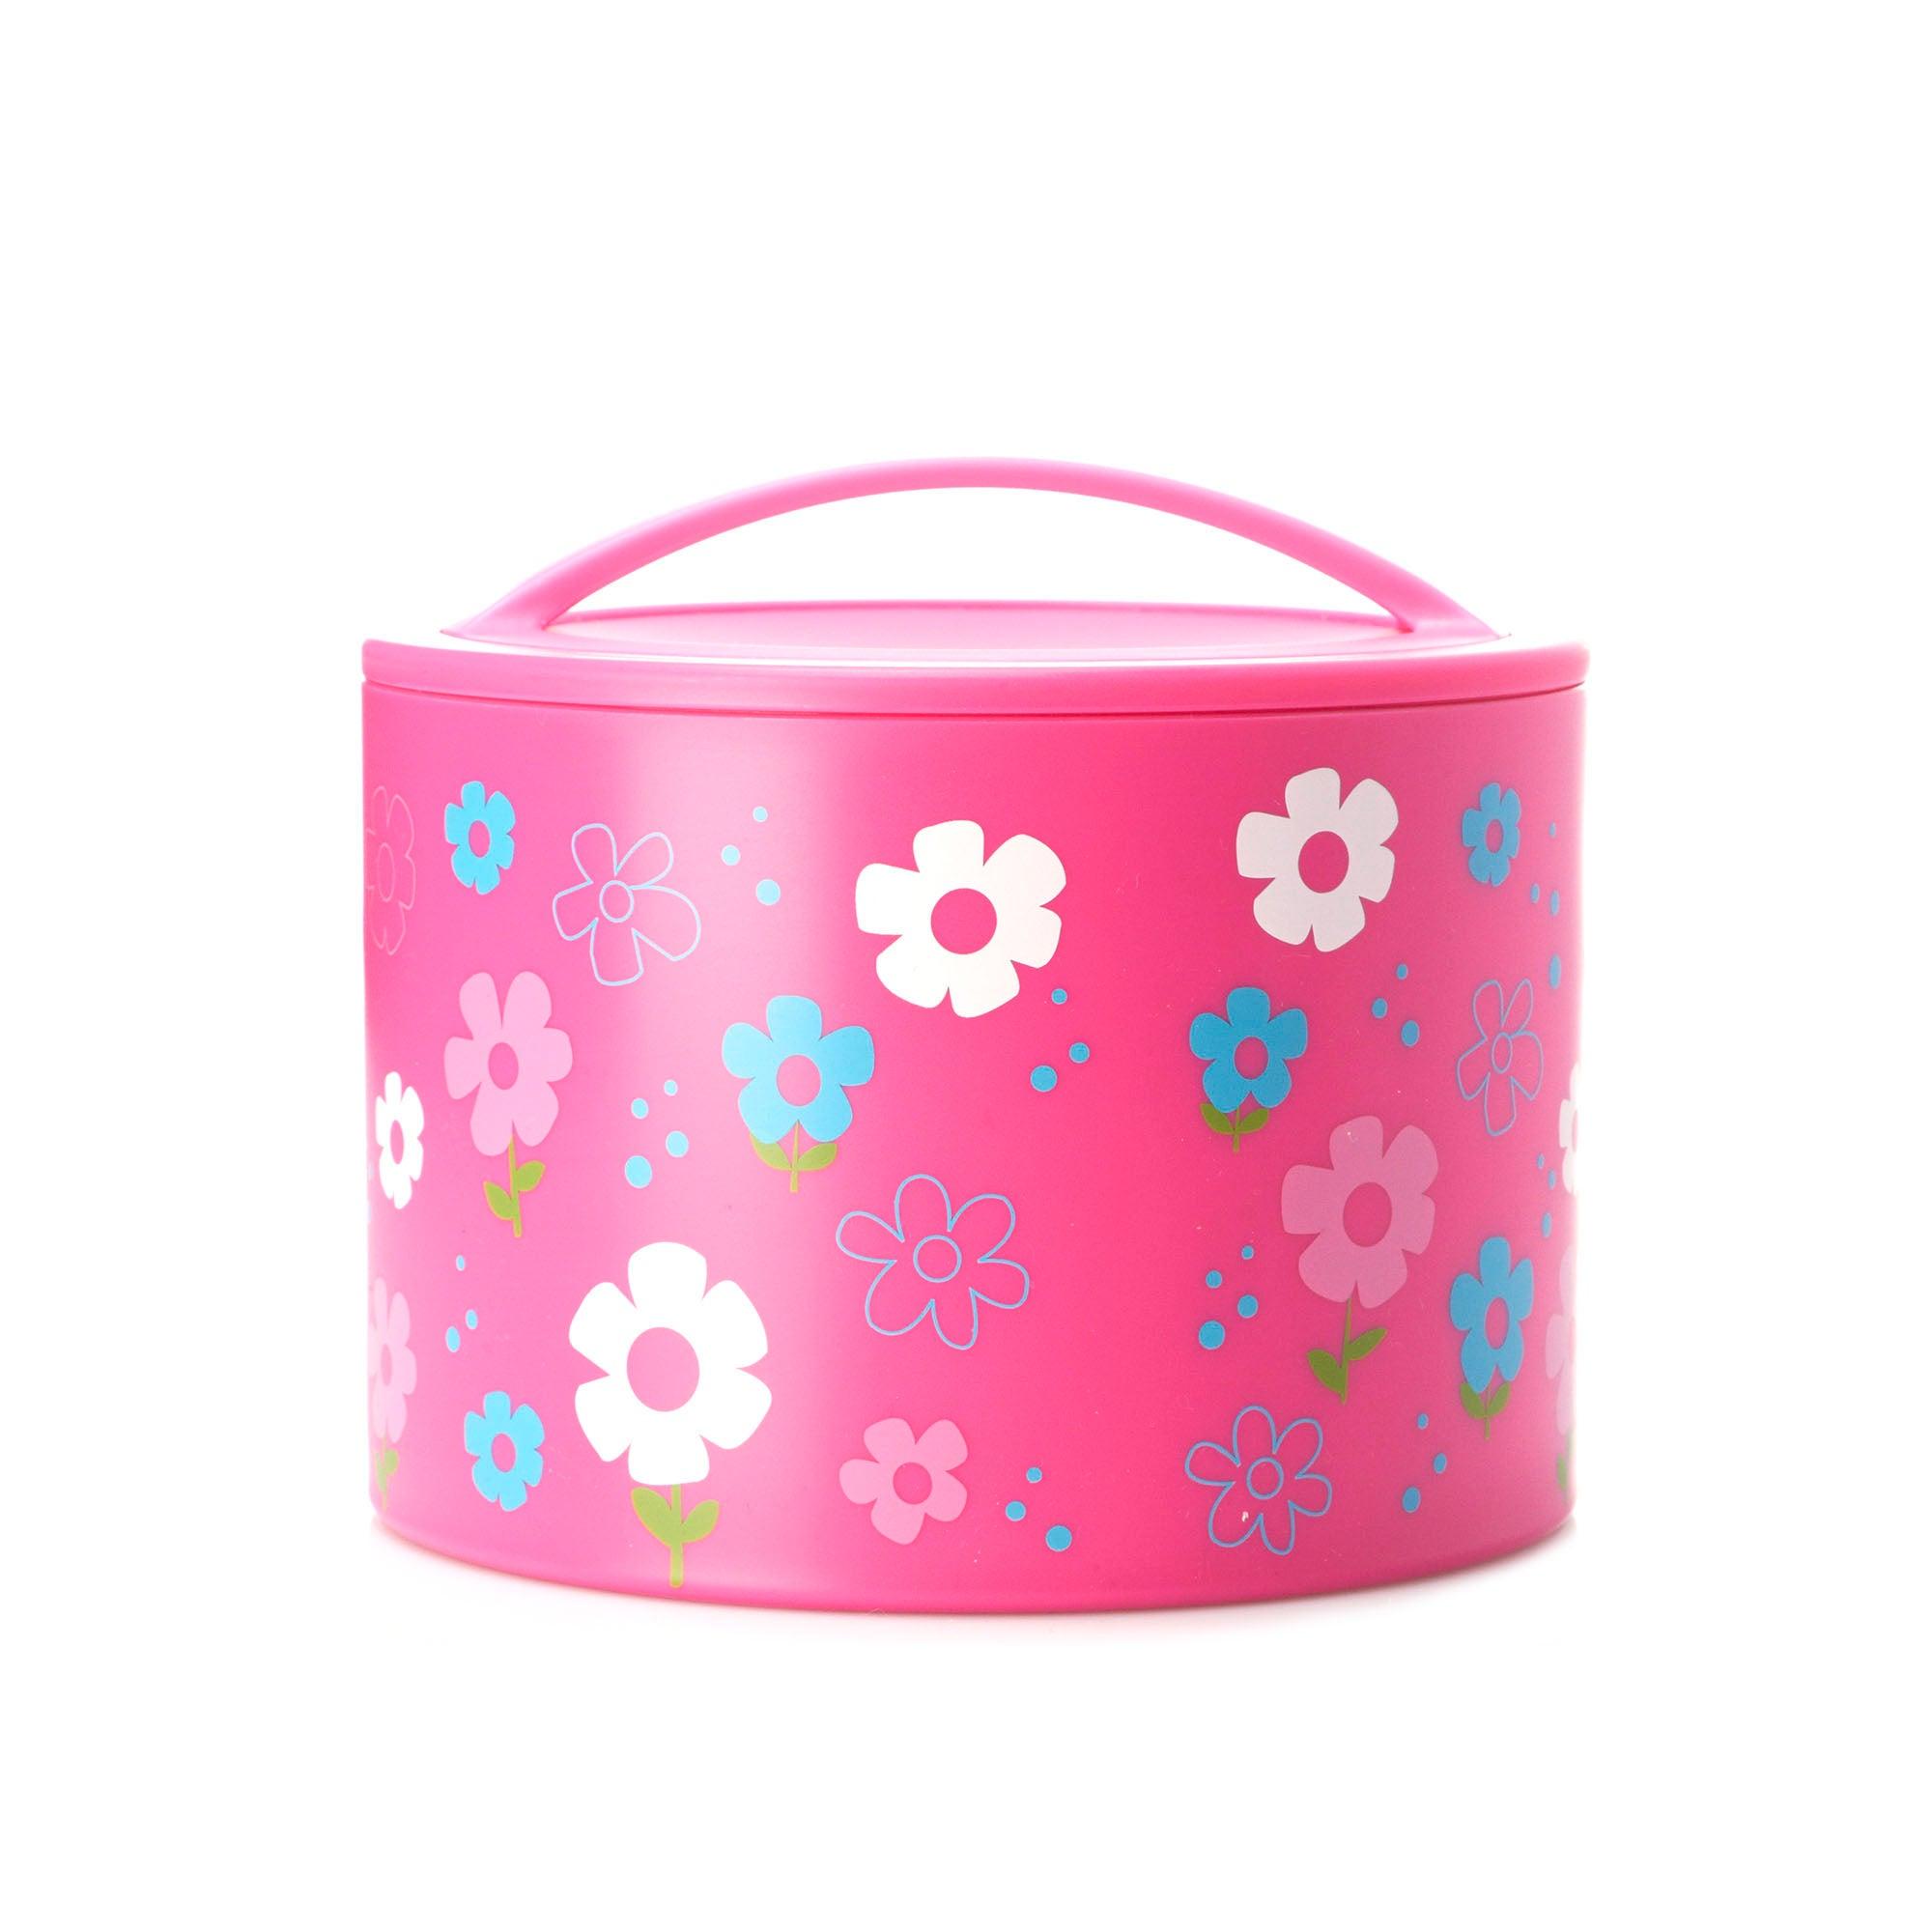 Aladdin Pink Bento Lunch Box